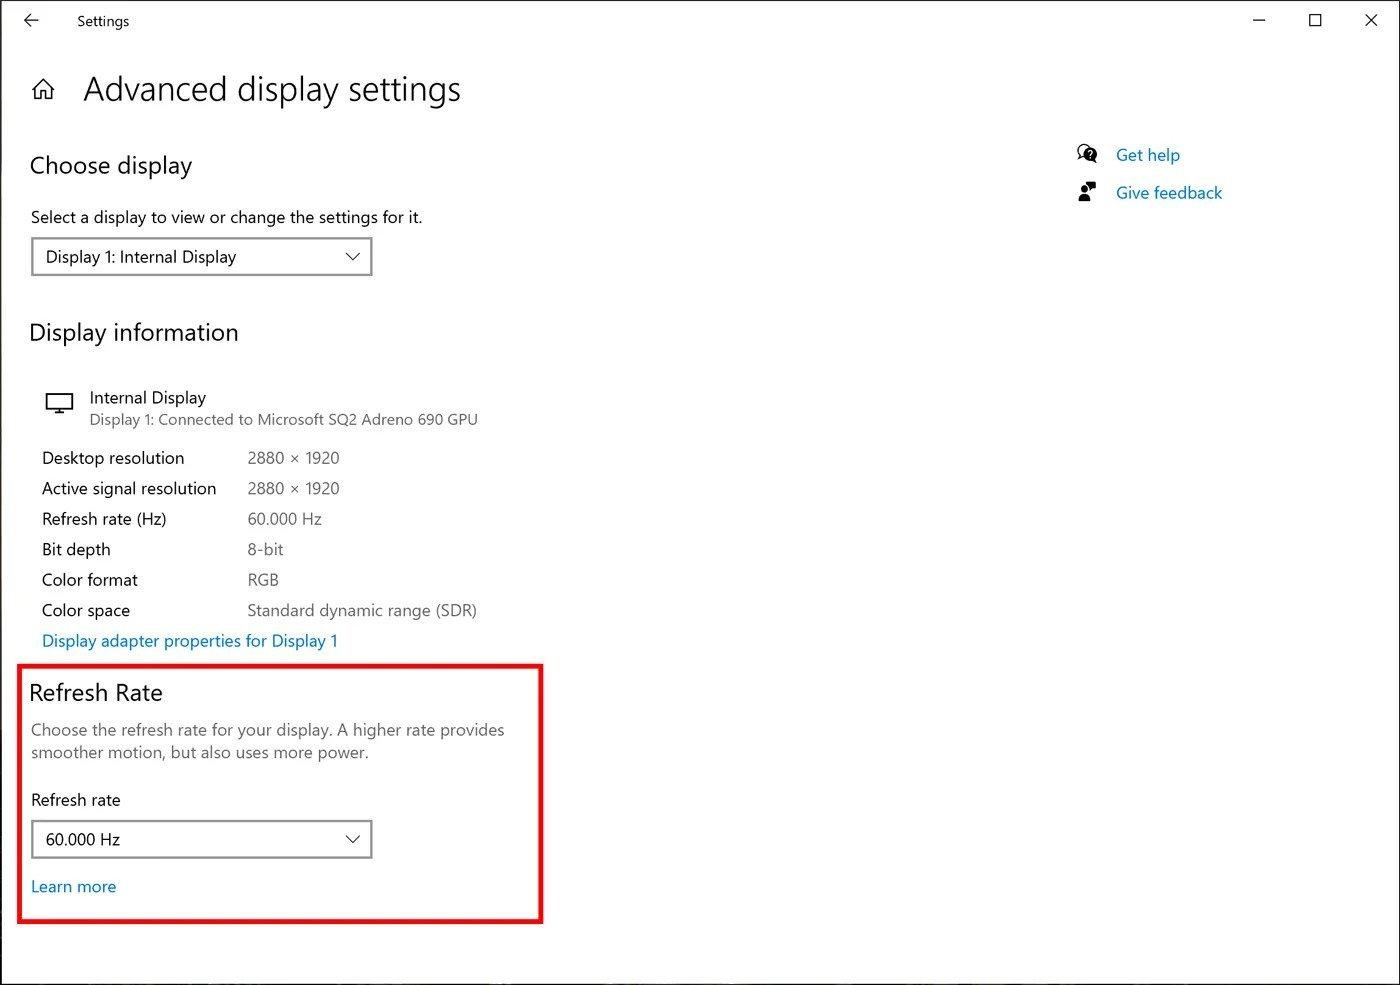 windows 10 rate - Windows 10 με ρυθμίσεις για τον ρυθμό ανανέωσης της οθόνης